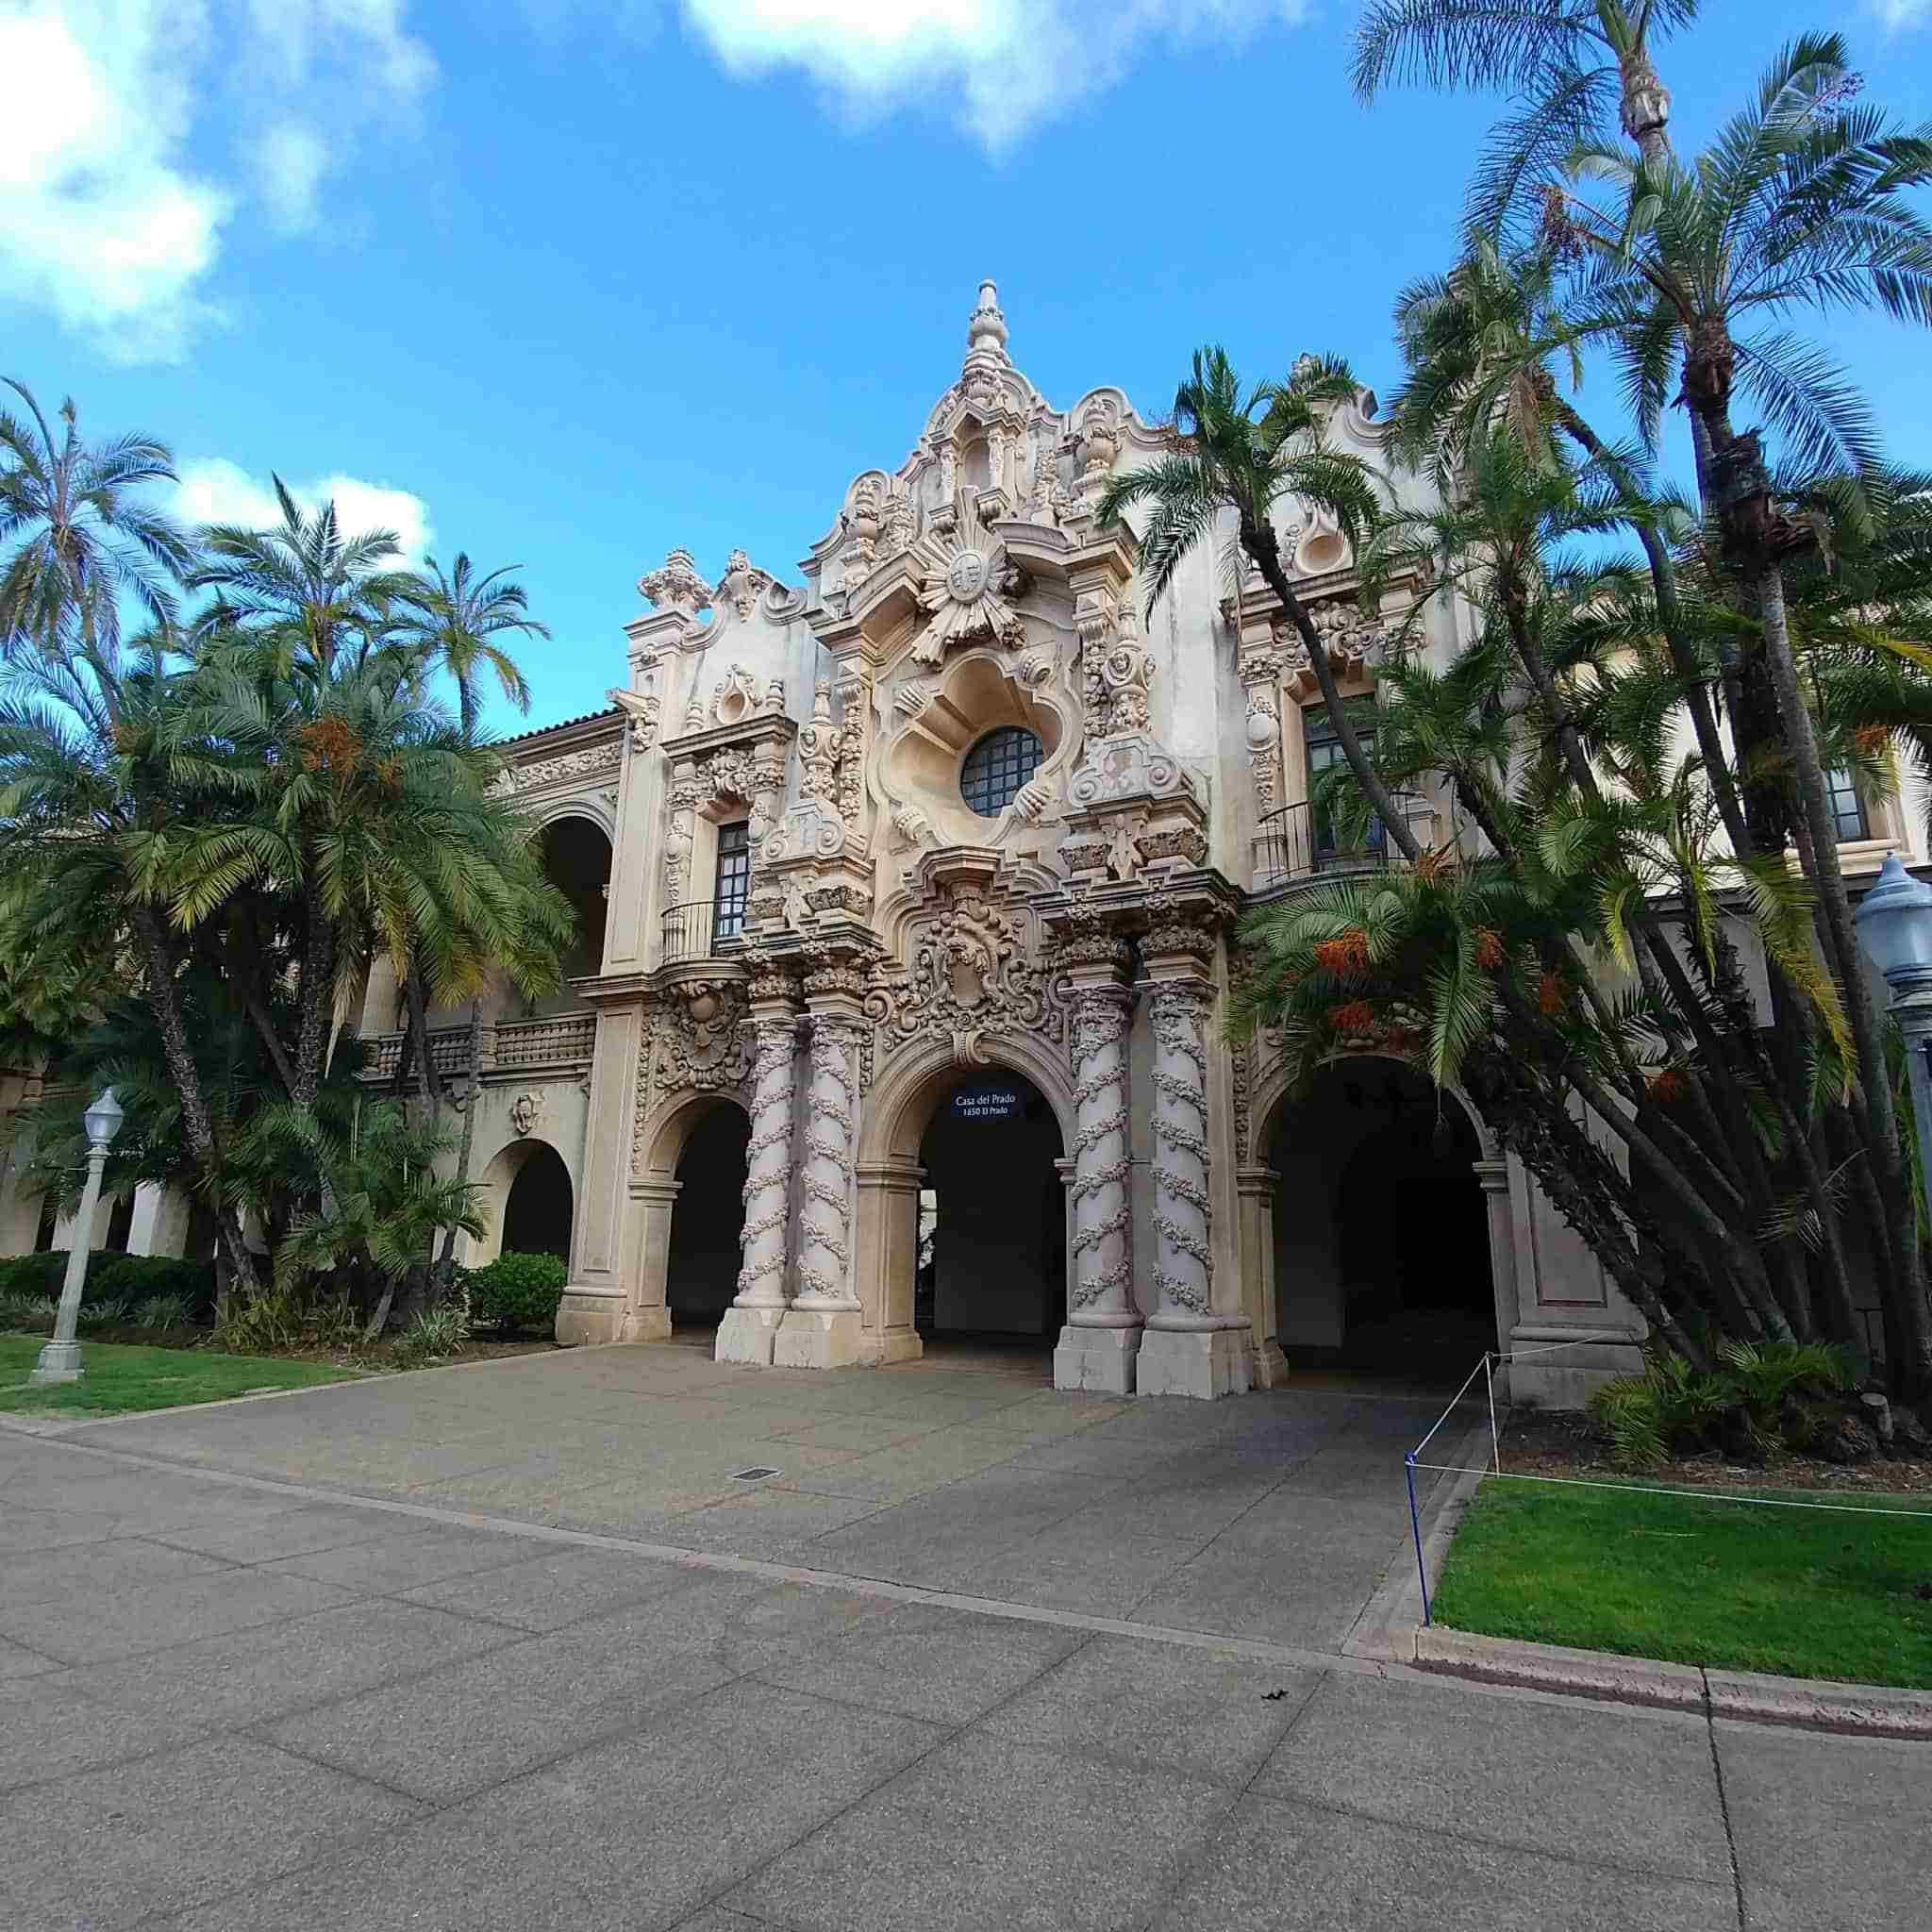 Balboa Park La Jolla California architecture buildings with palm trees